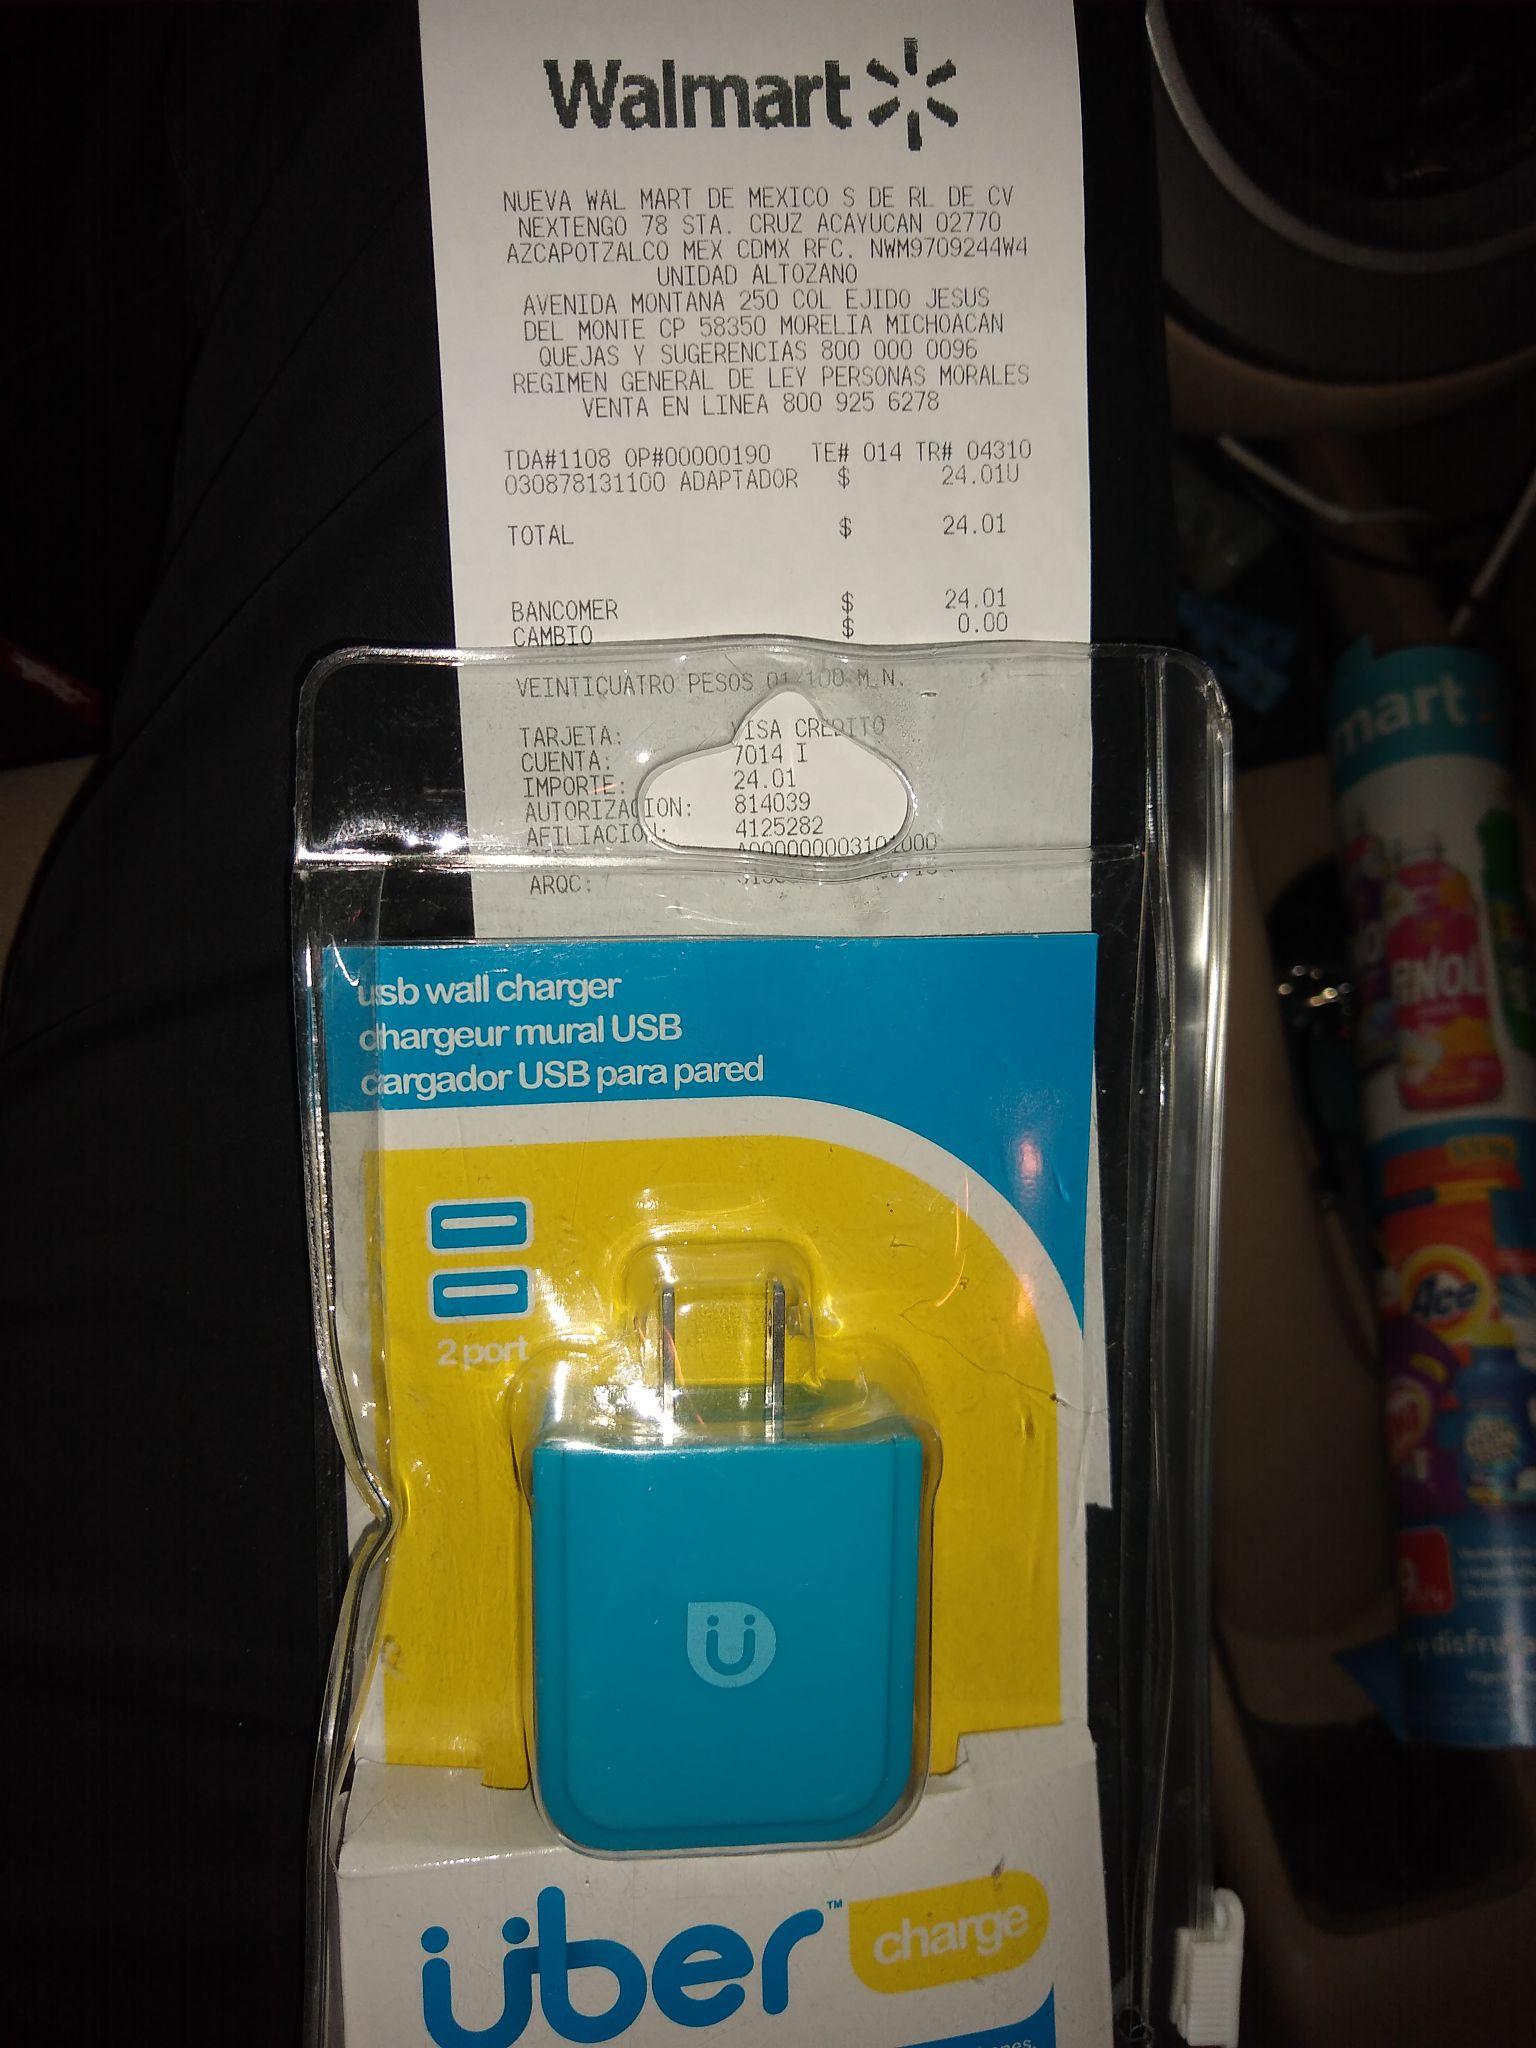 Walmart: Cargador 2.4 Ampers doblé